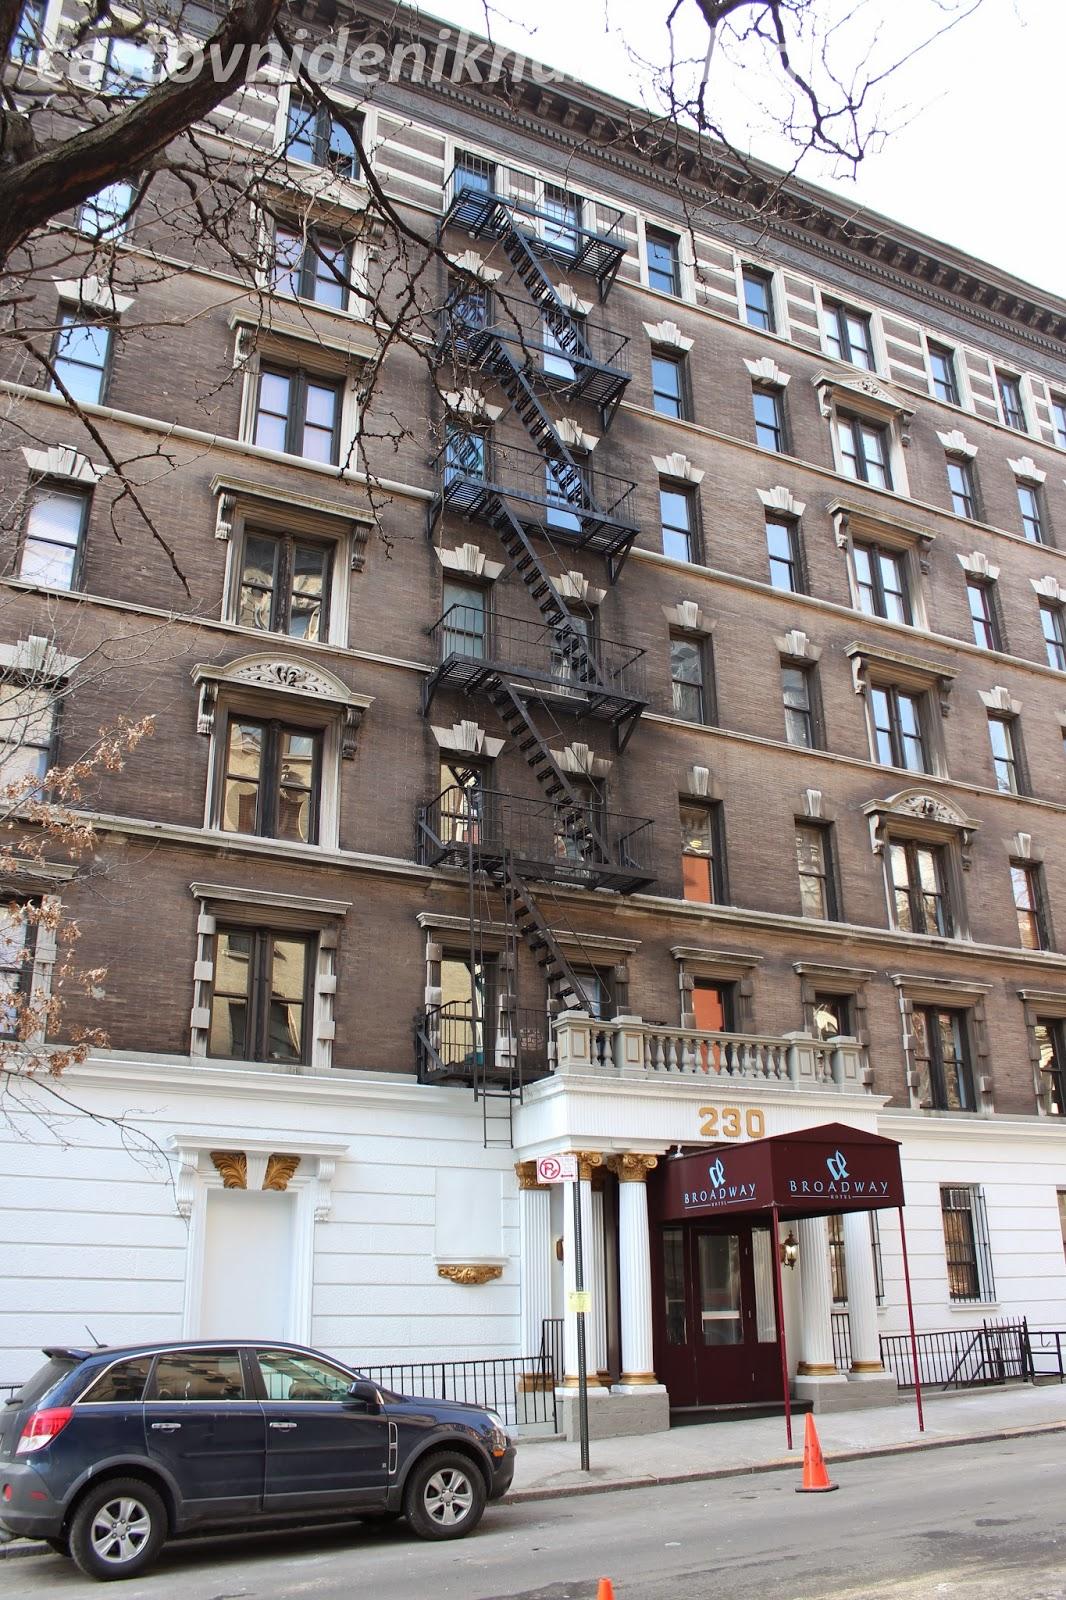 Broadway Hotel